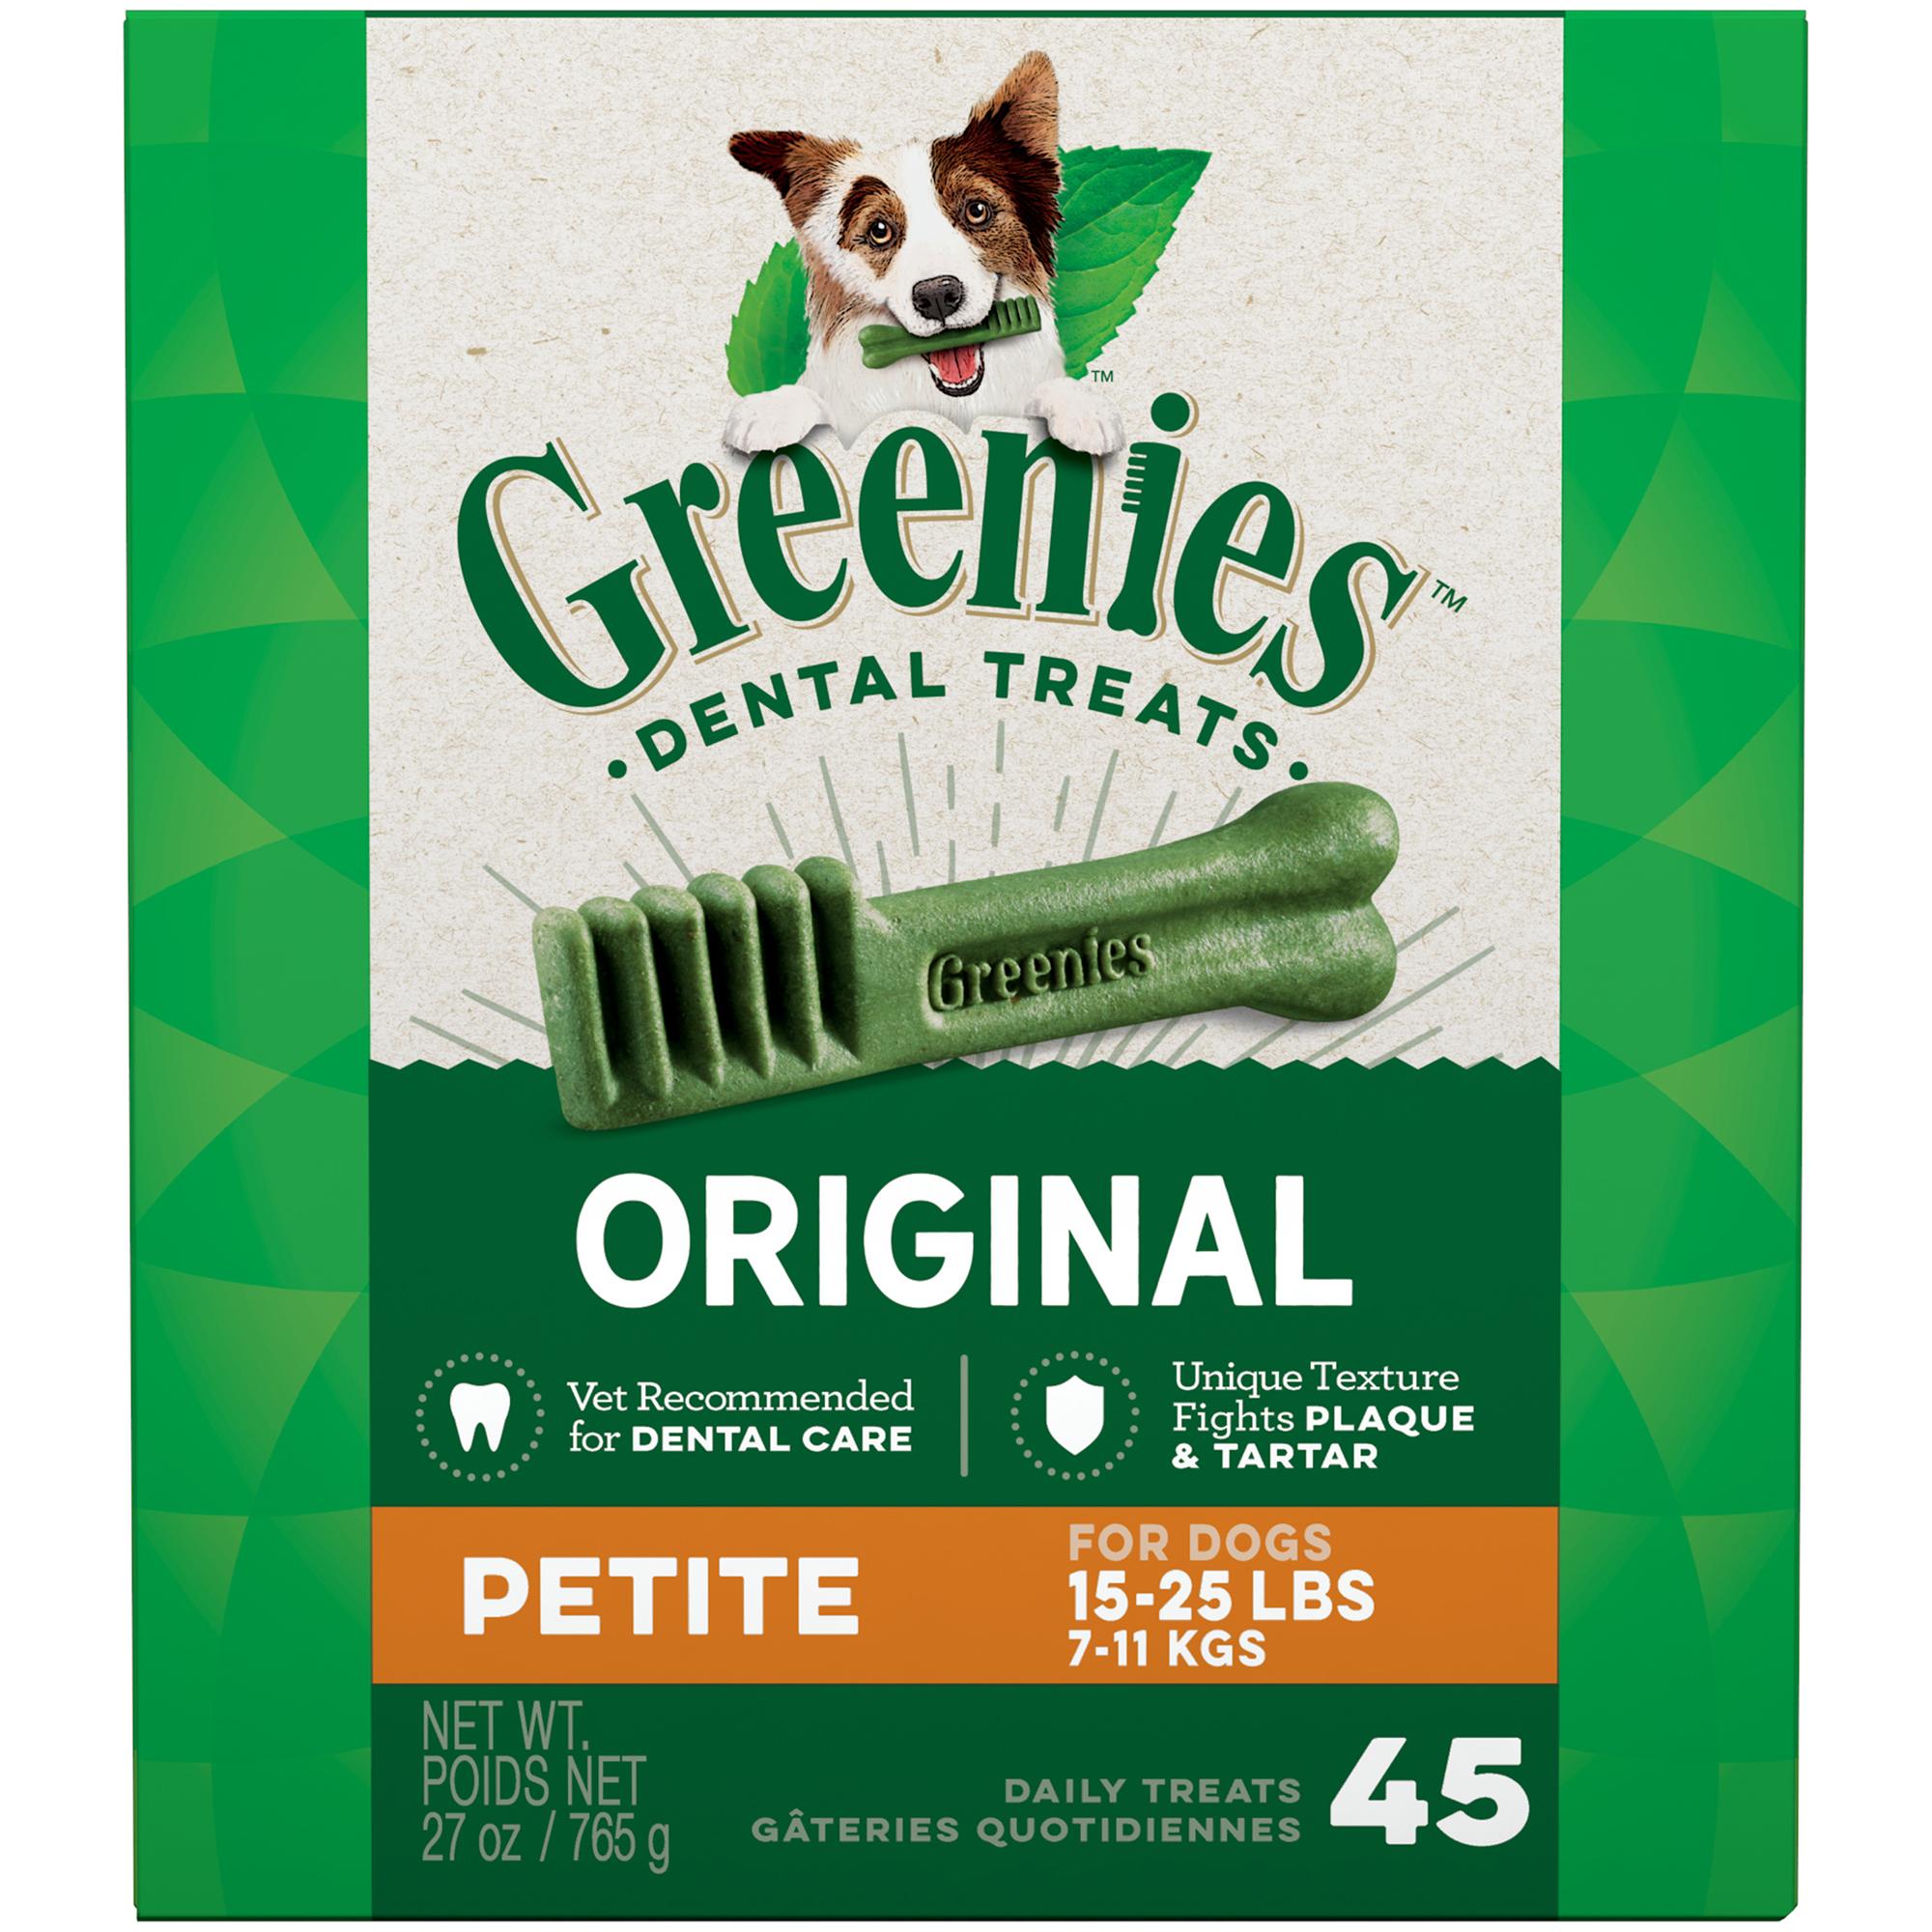 Greenies Original Petite Dental Dog Treats, 27 oz. Pack (45 Treats)